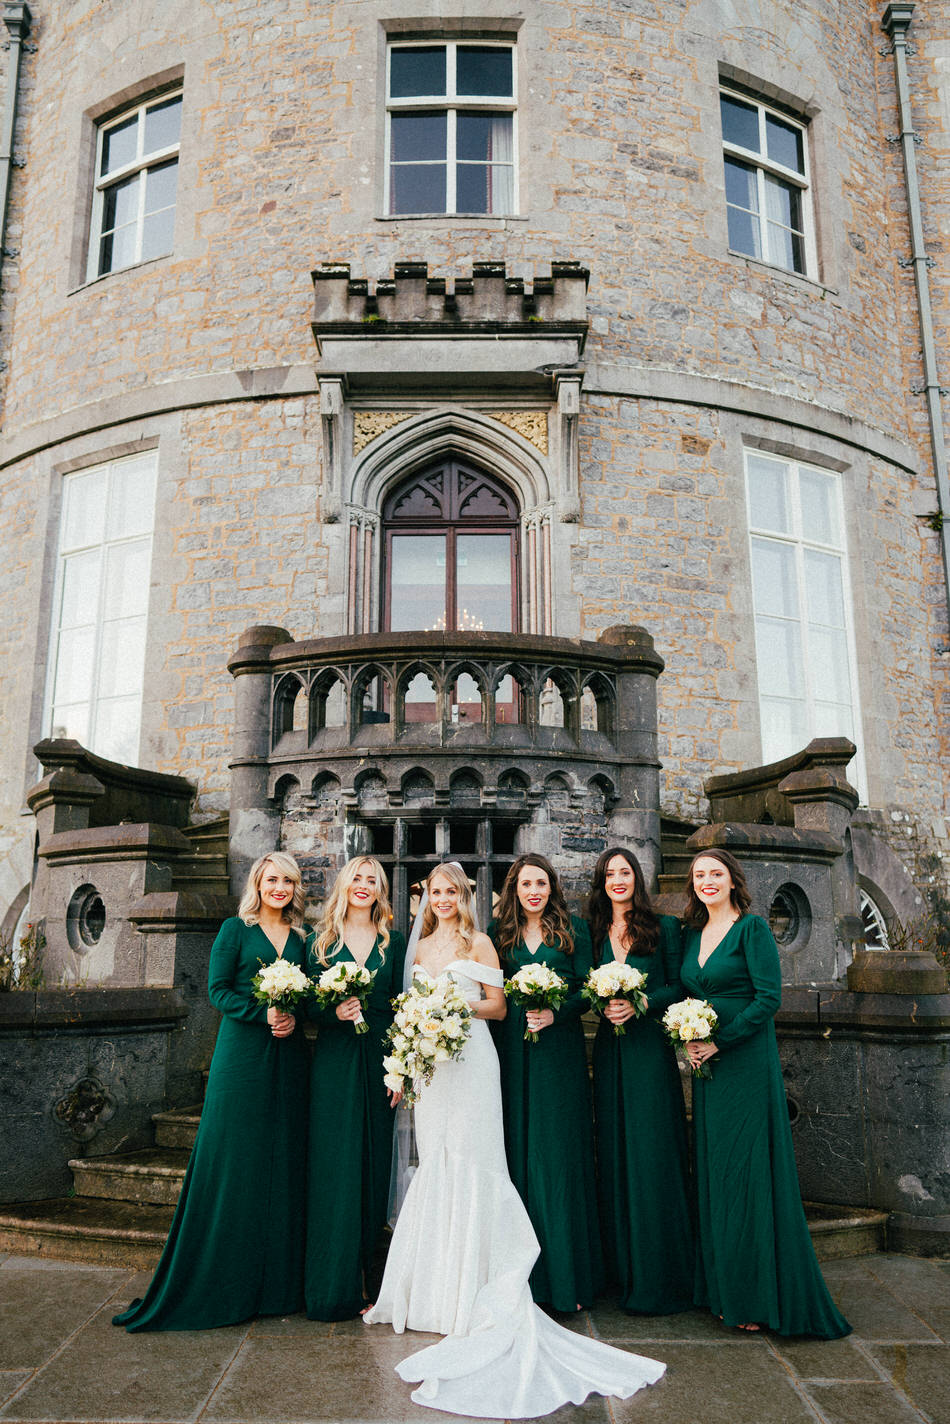 Castle-wedding-ireland-photos- 0212 152